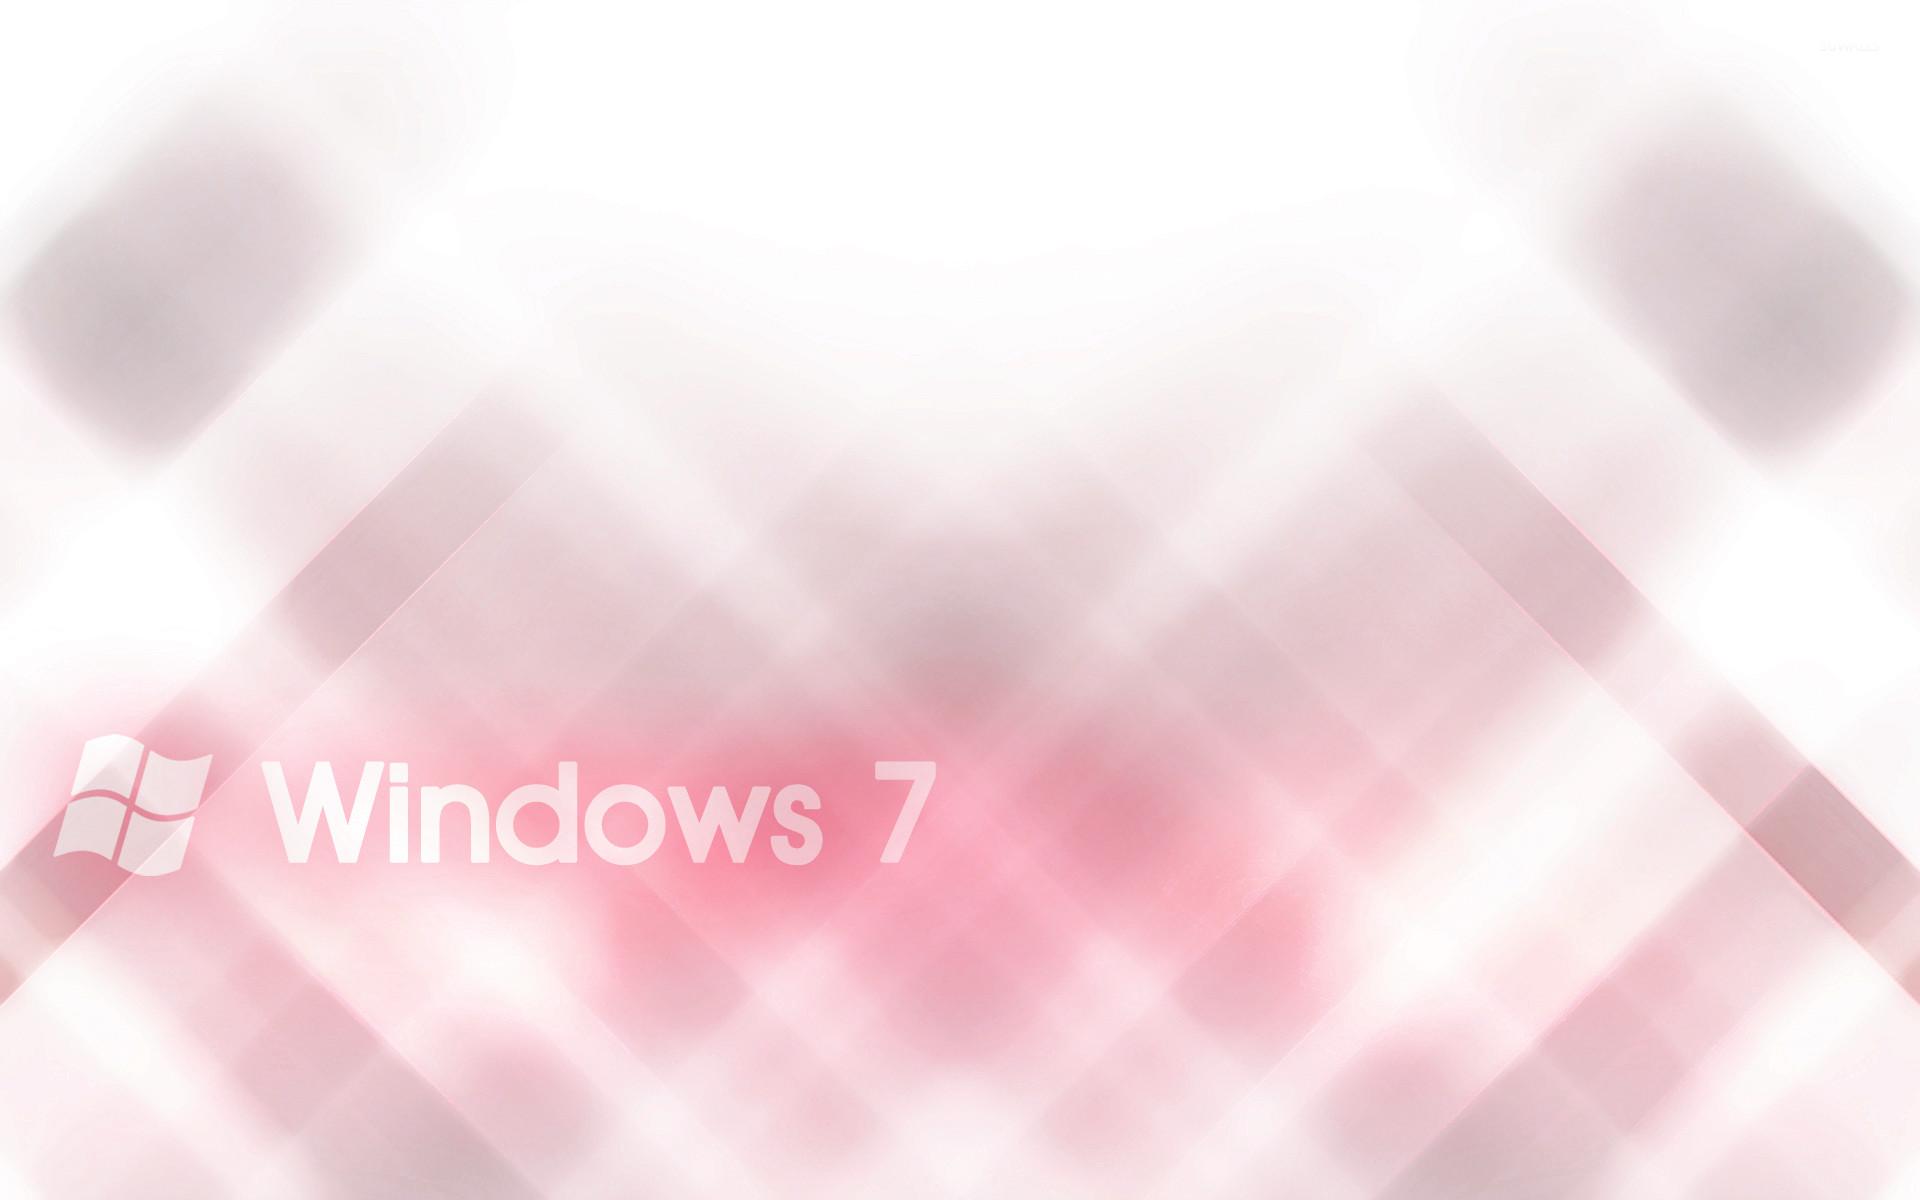 White Windows 7 on pink blur wallpaper